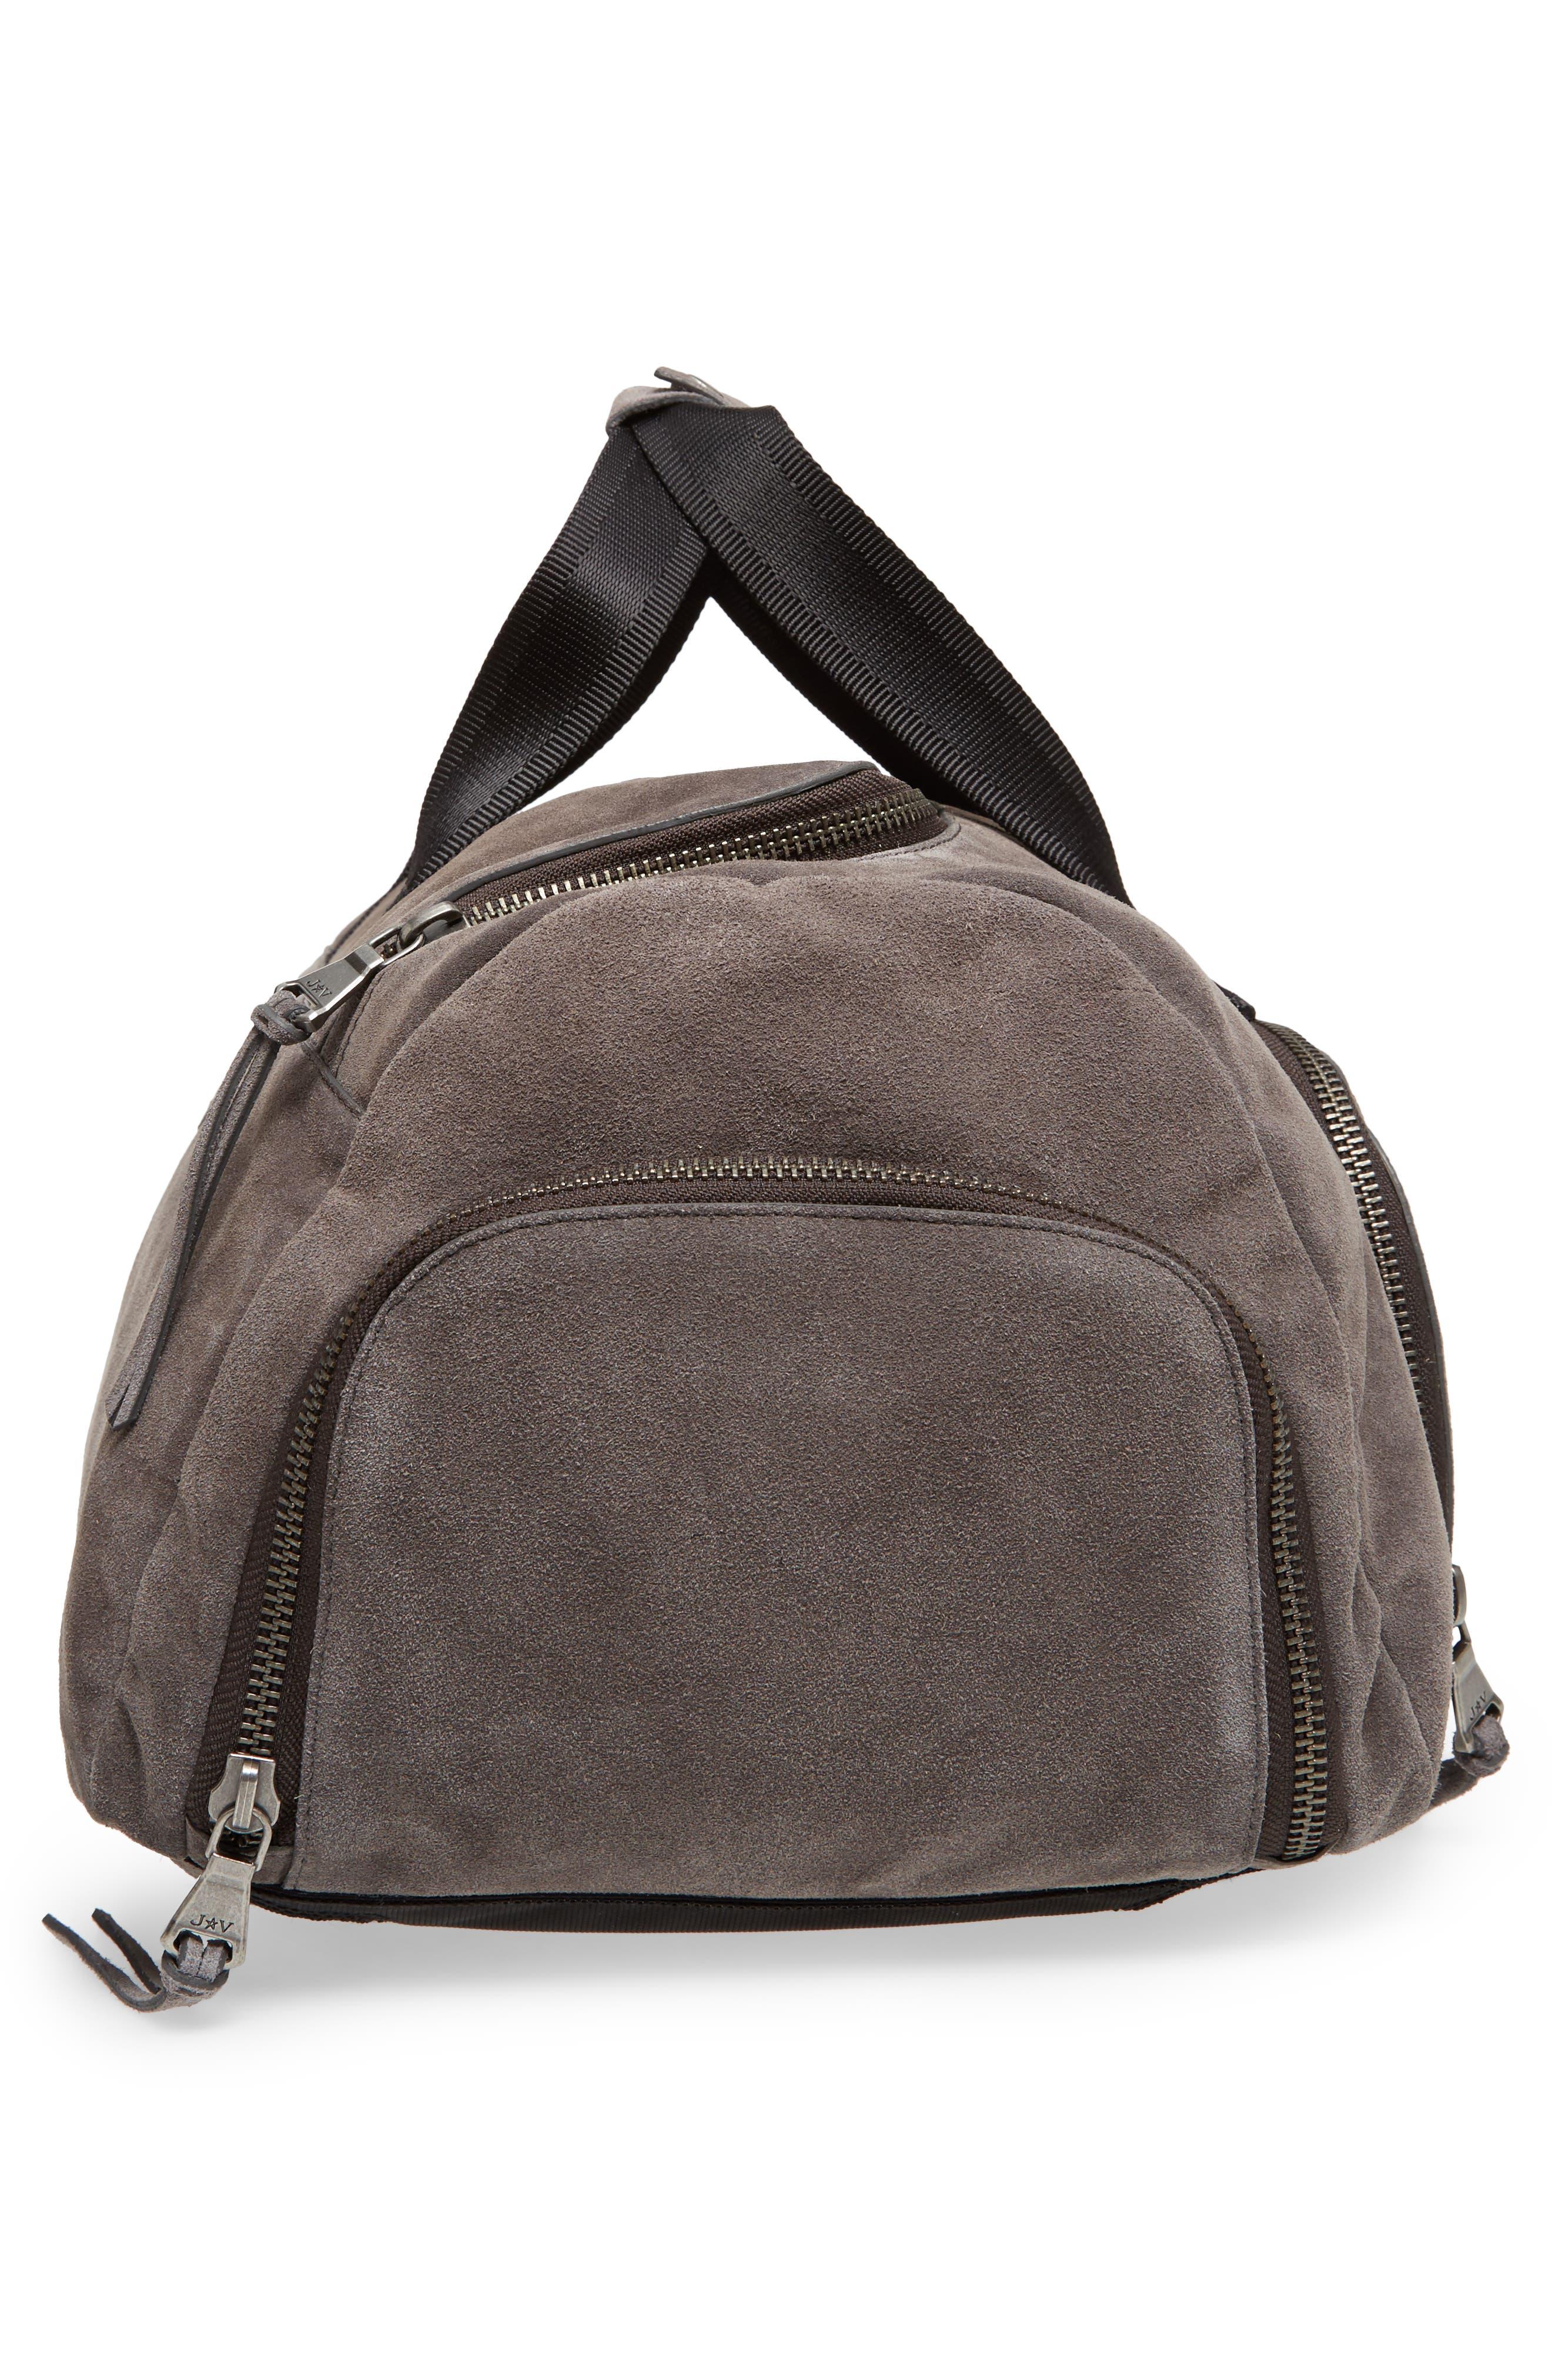 Brooklyn Suede Convertible Duffel Bag,                             Alternate thumbnail 11, color,